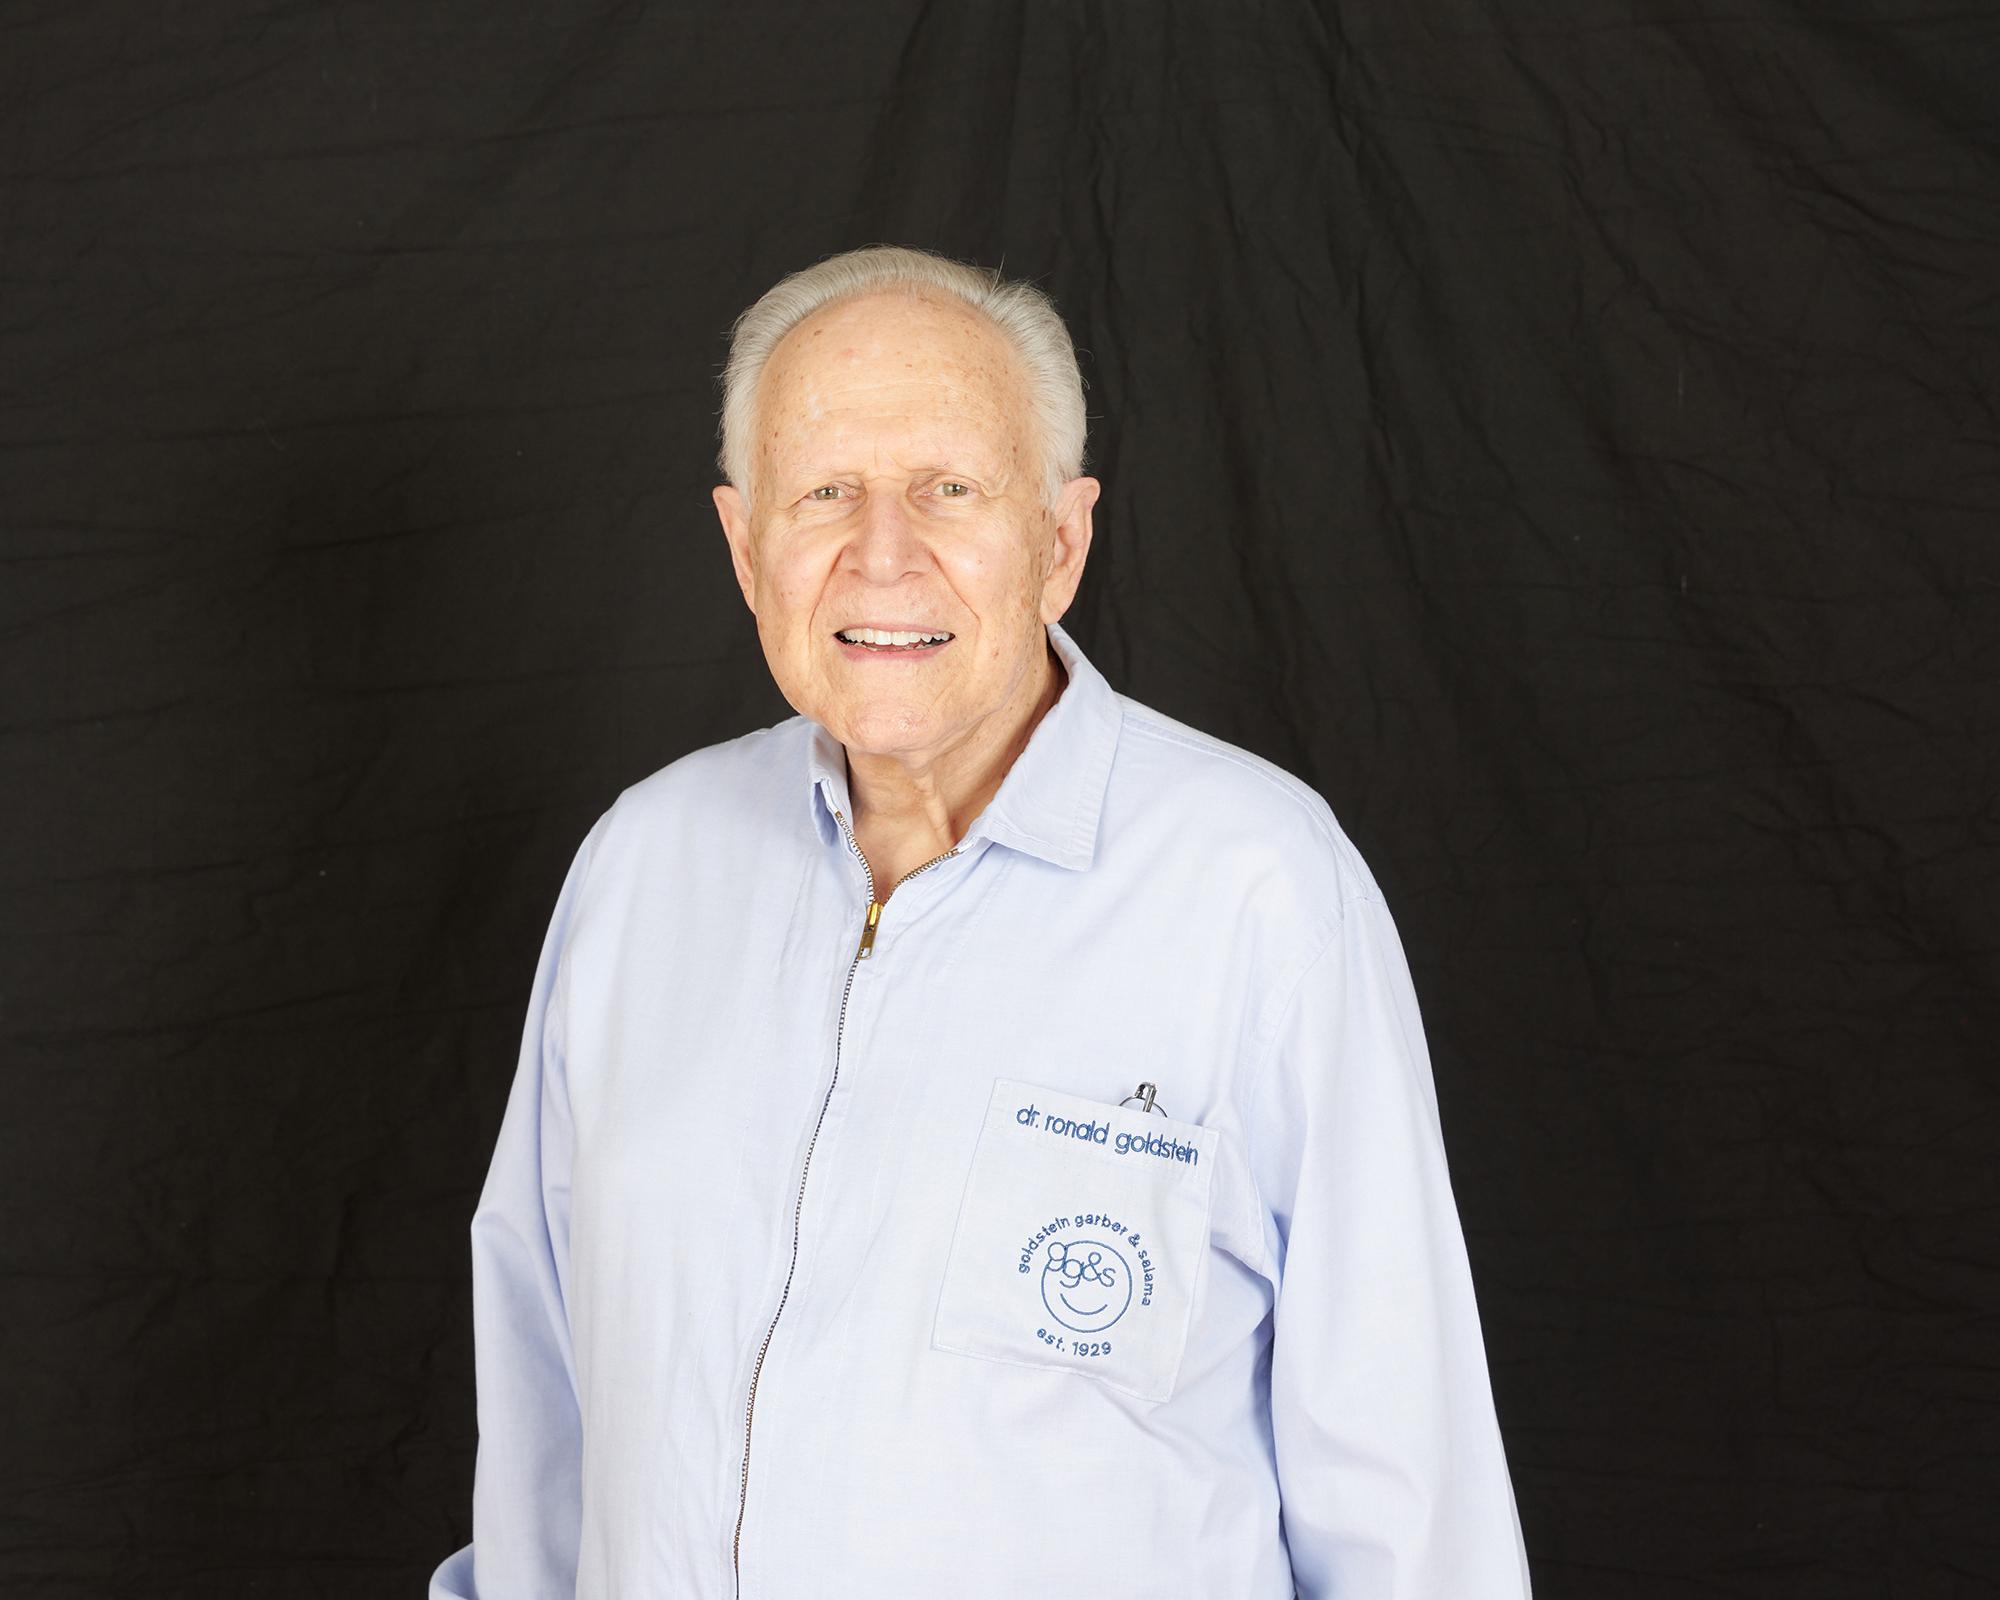 Dr. Ronald E. Goldstein